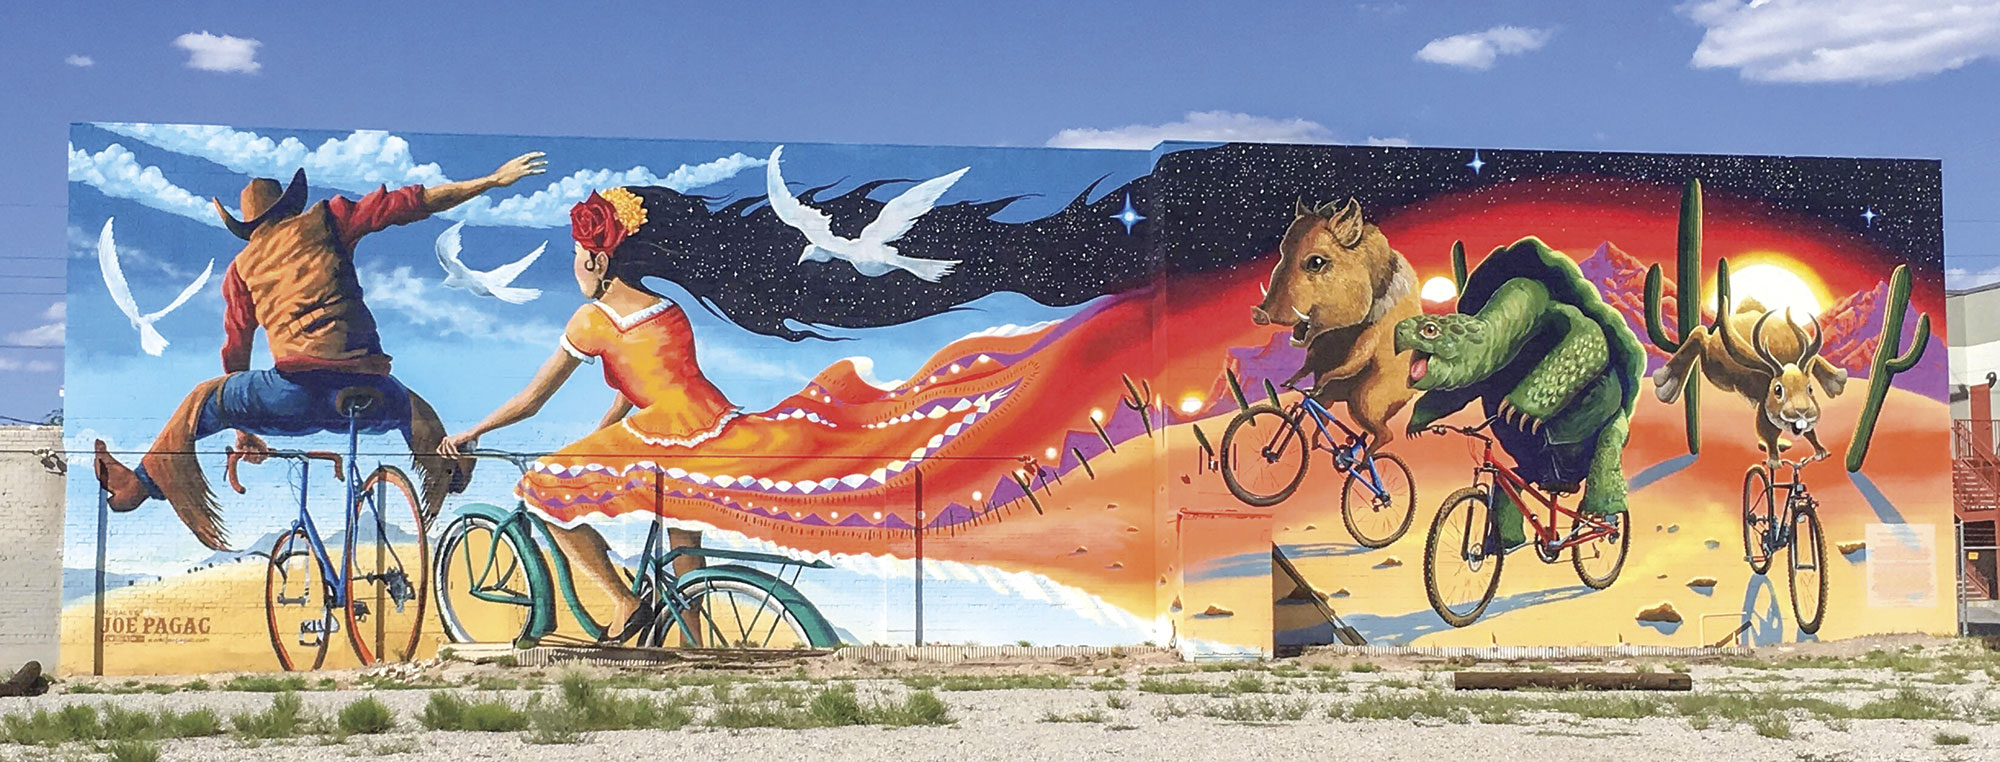 Joe Pagac's Dalí-esque artworks; Photo courtesy Visit Tucson